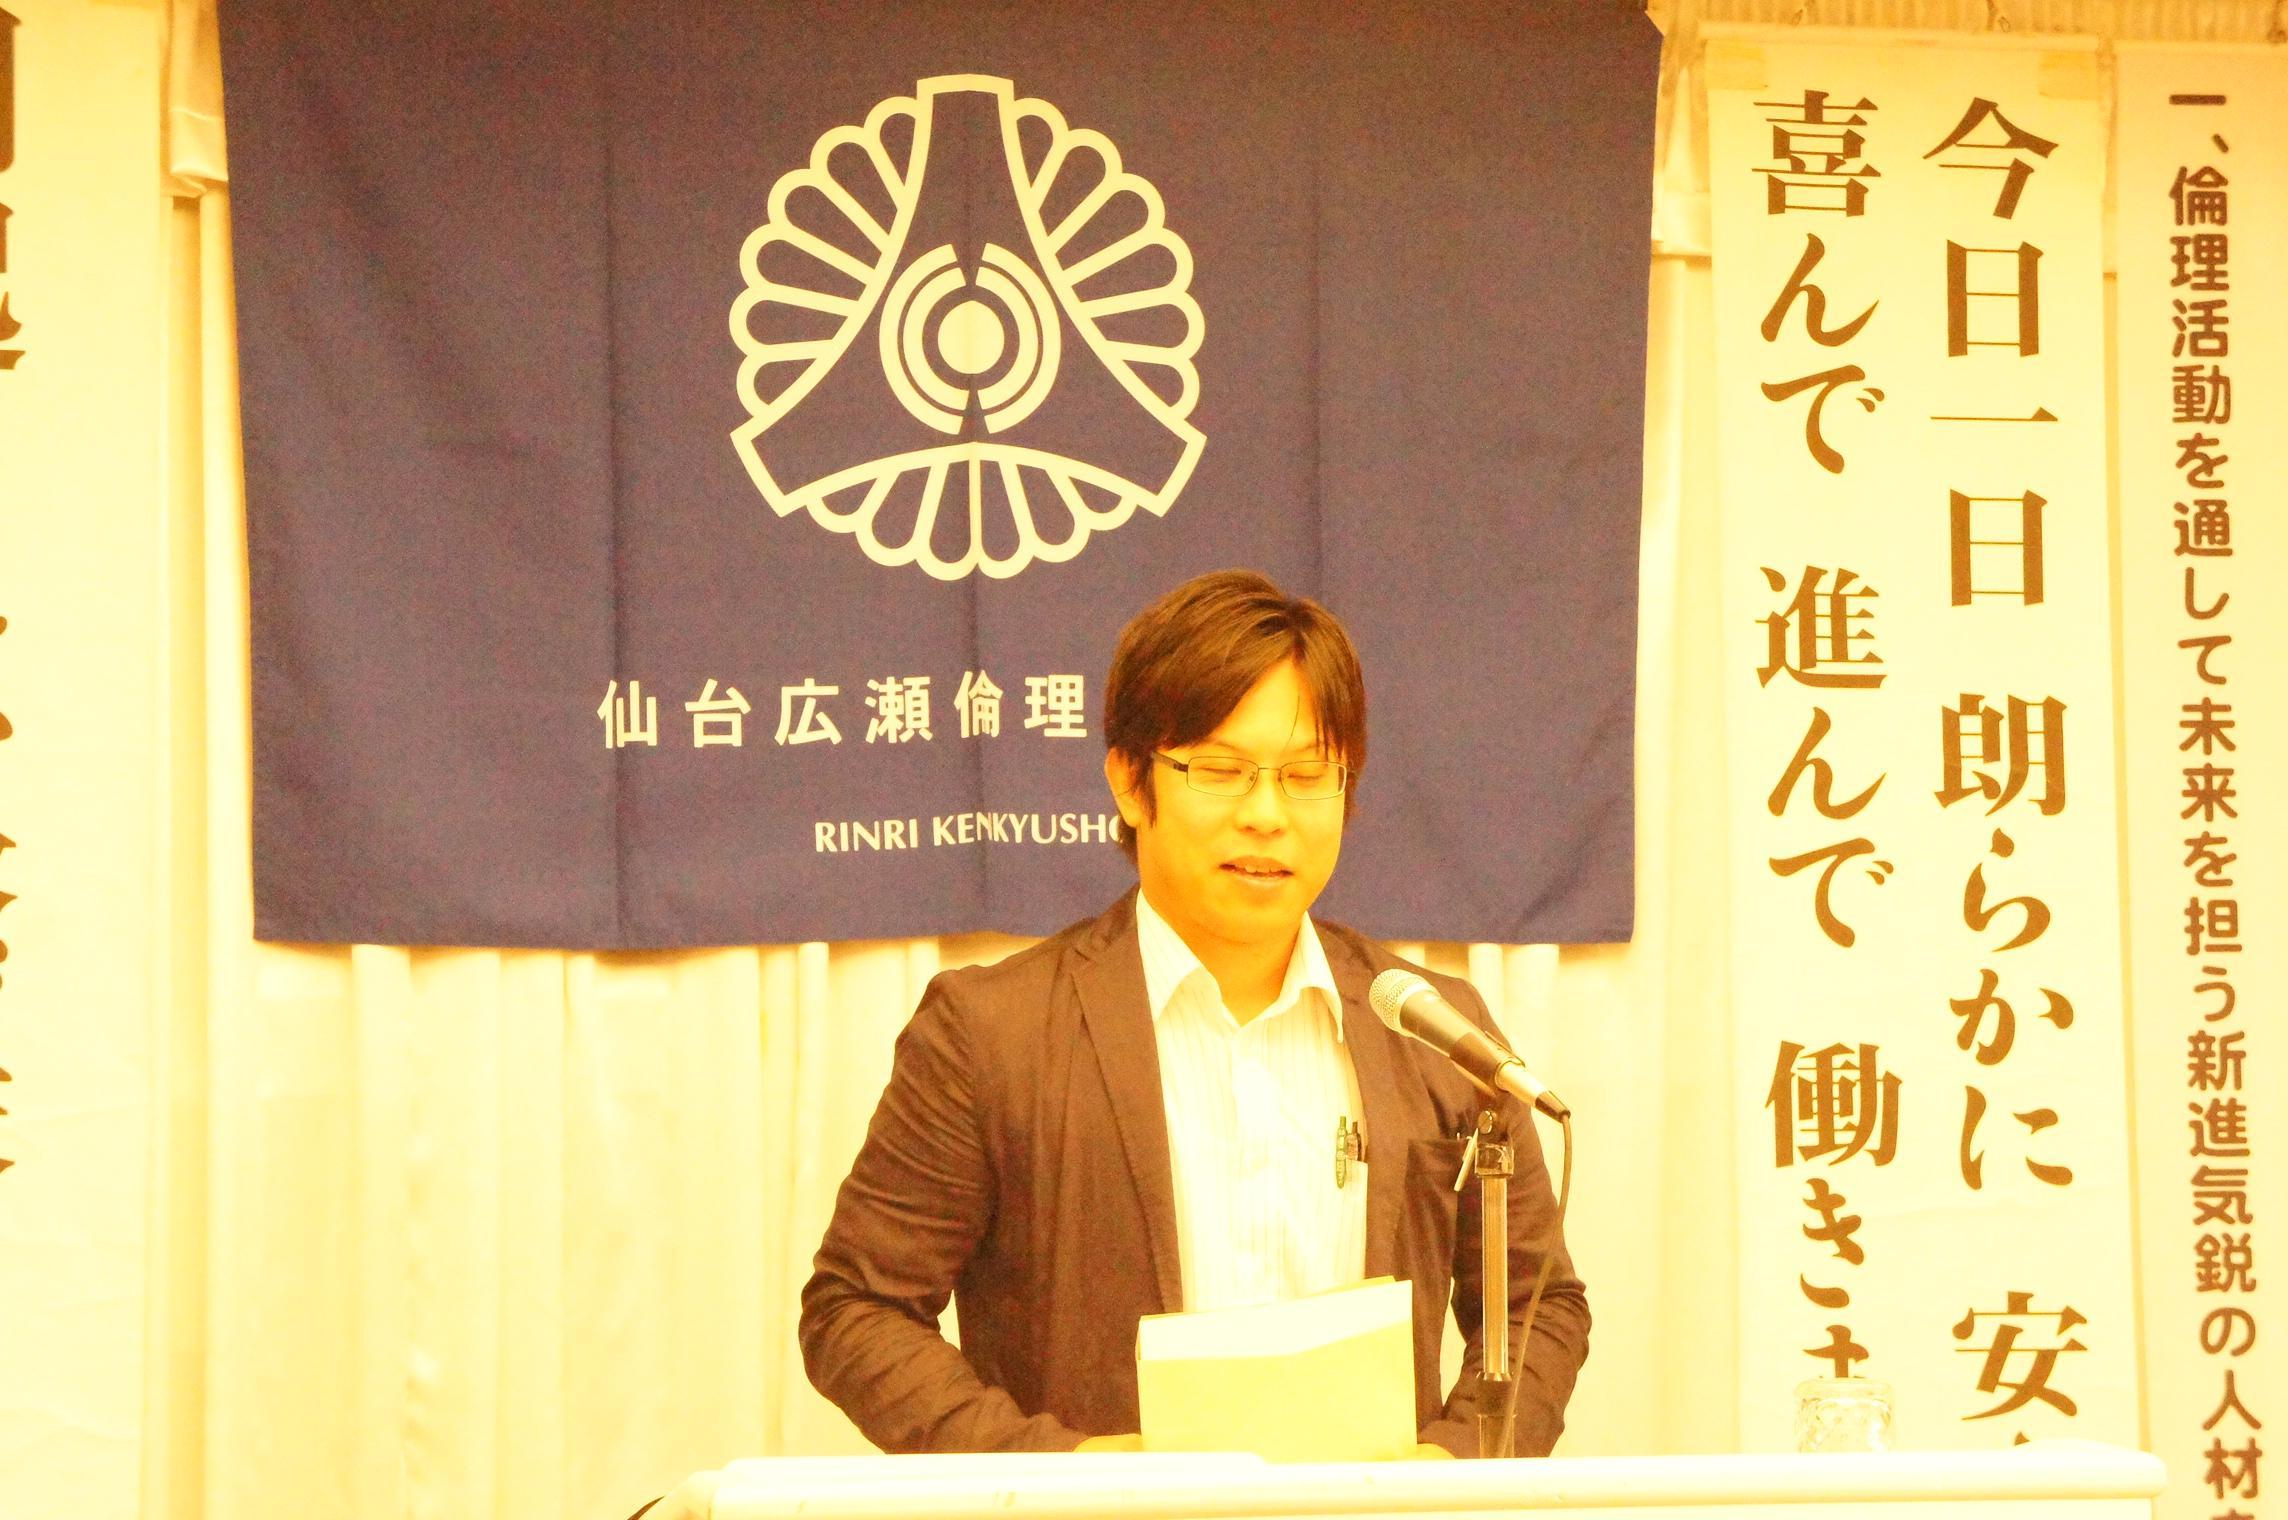 坂田英輝さん 新入会員 名札授与式